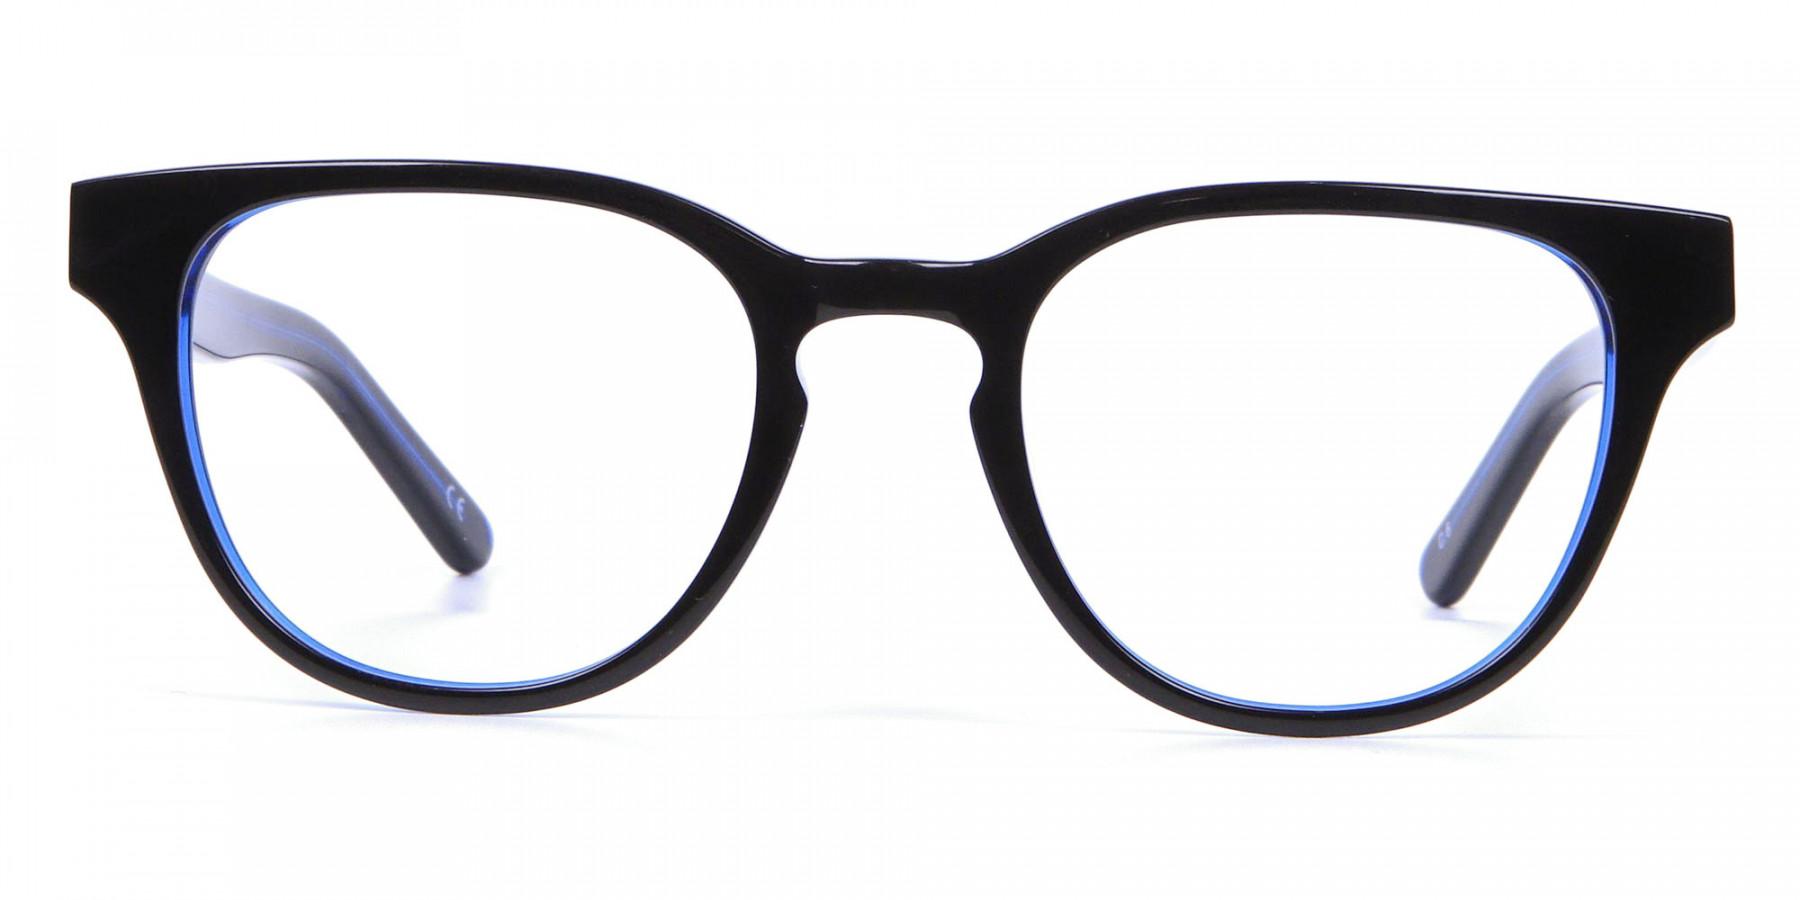 Cat Eye and Wayfarer Glasses in Blue